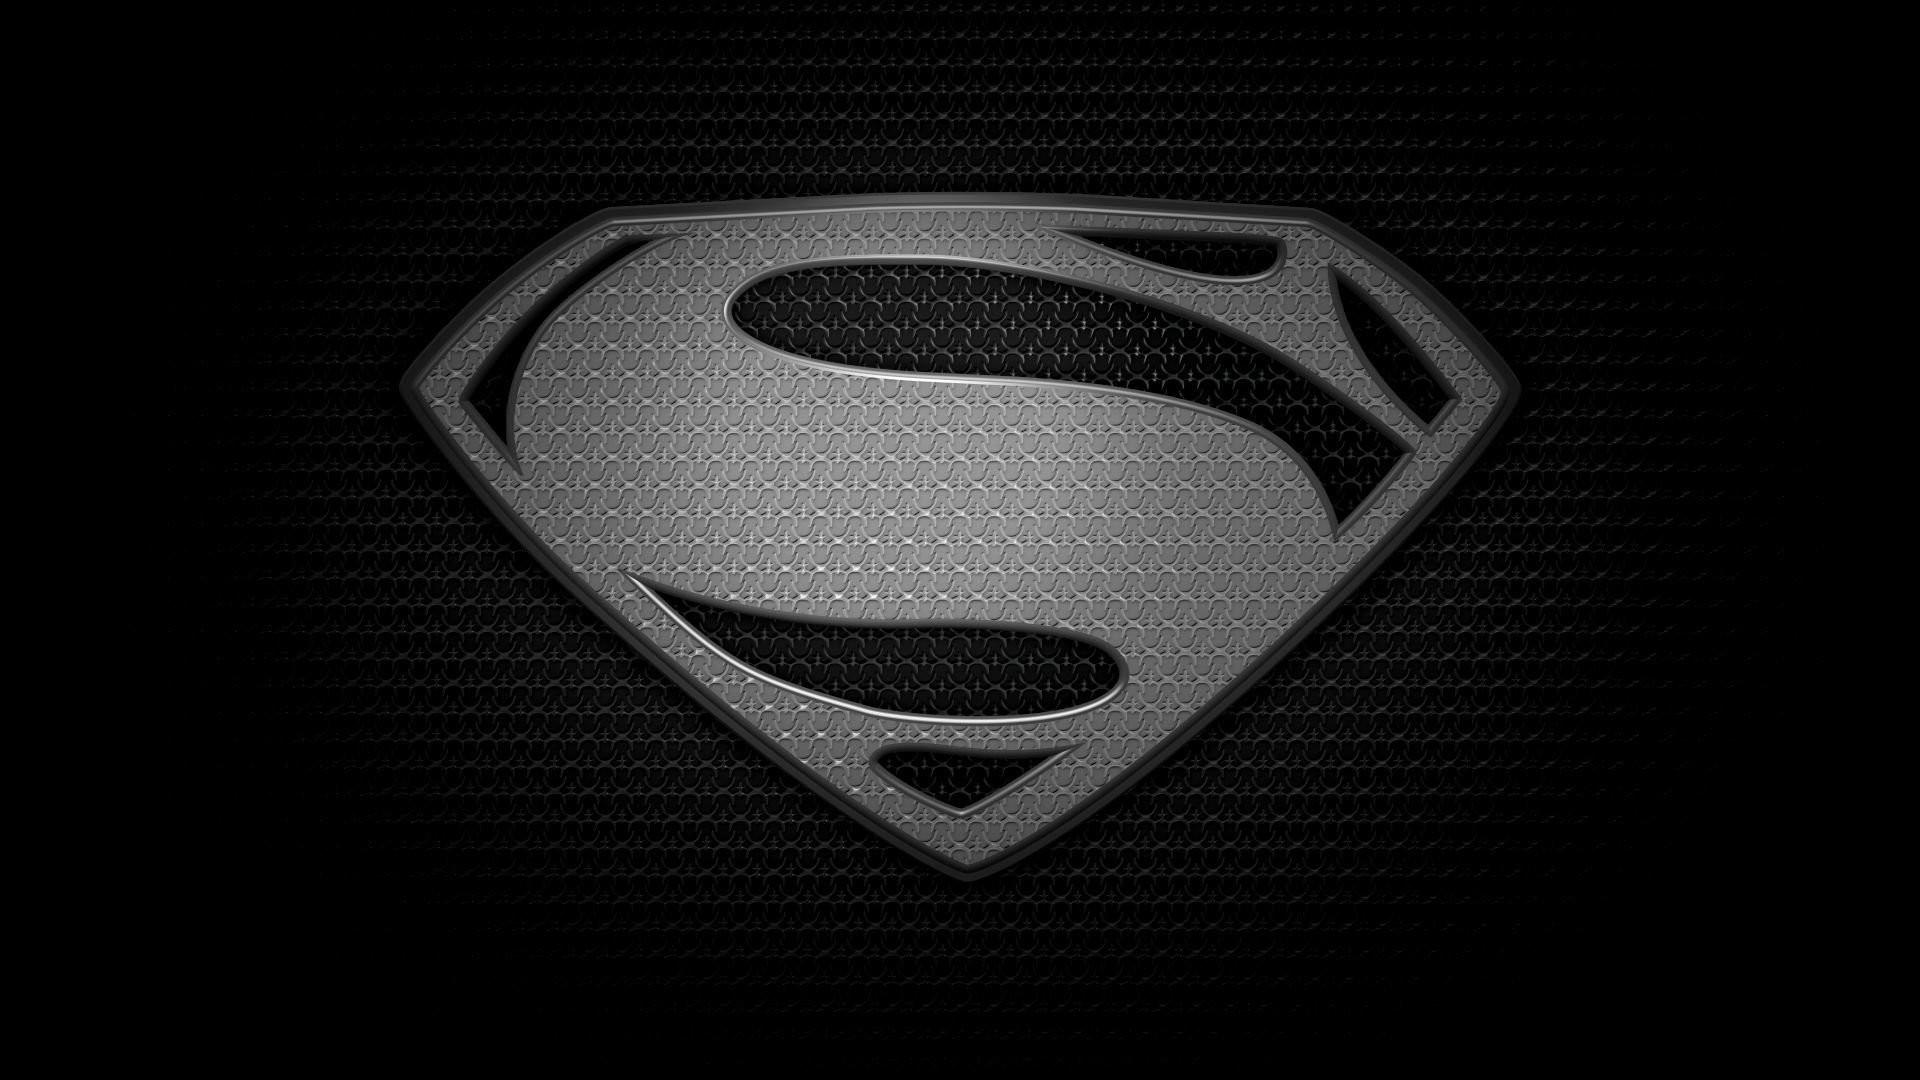 man of steel logo wallpaper 72 images